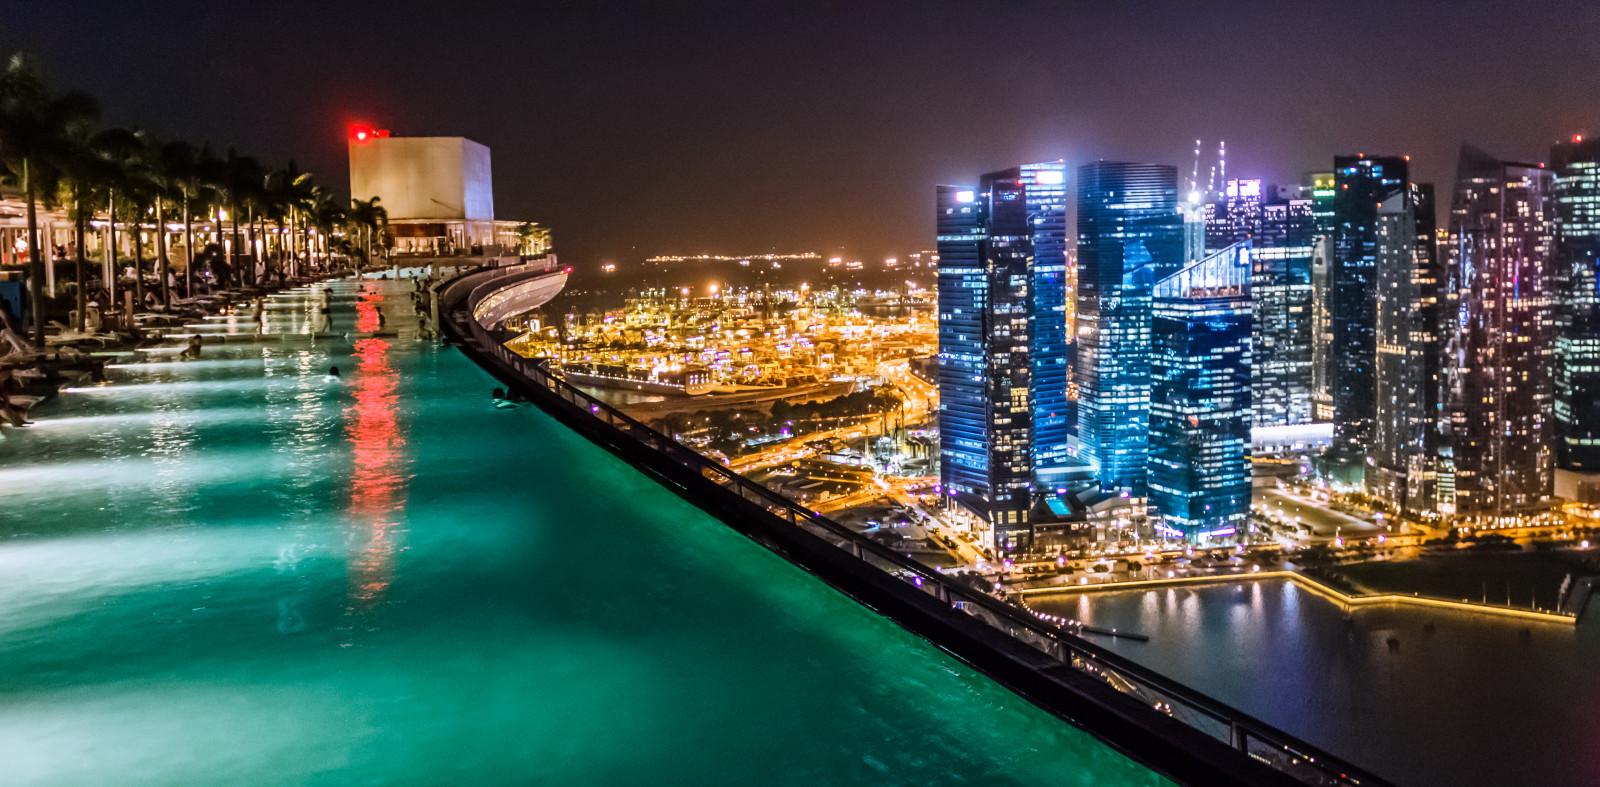 Sfondi cielo piscina nuoto hotel alto singapore for Piscina singapore